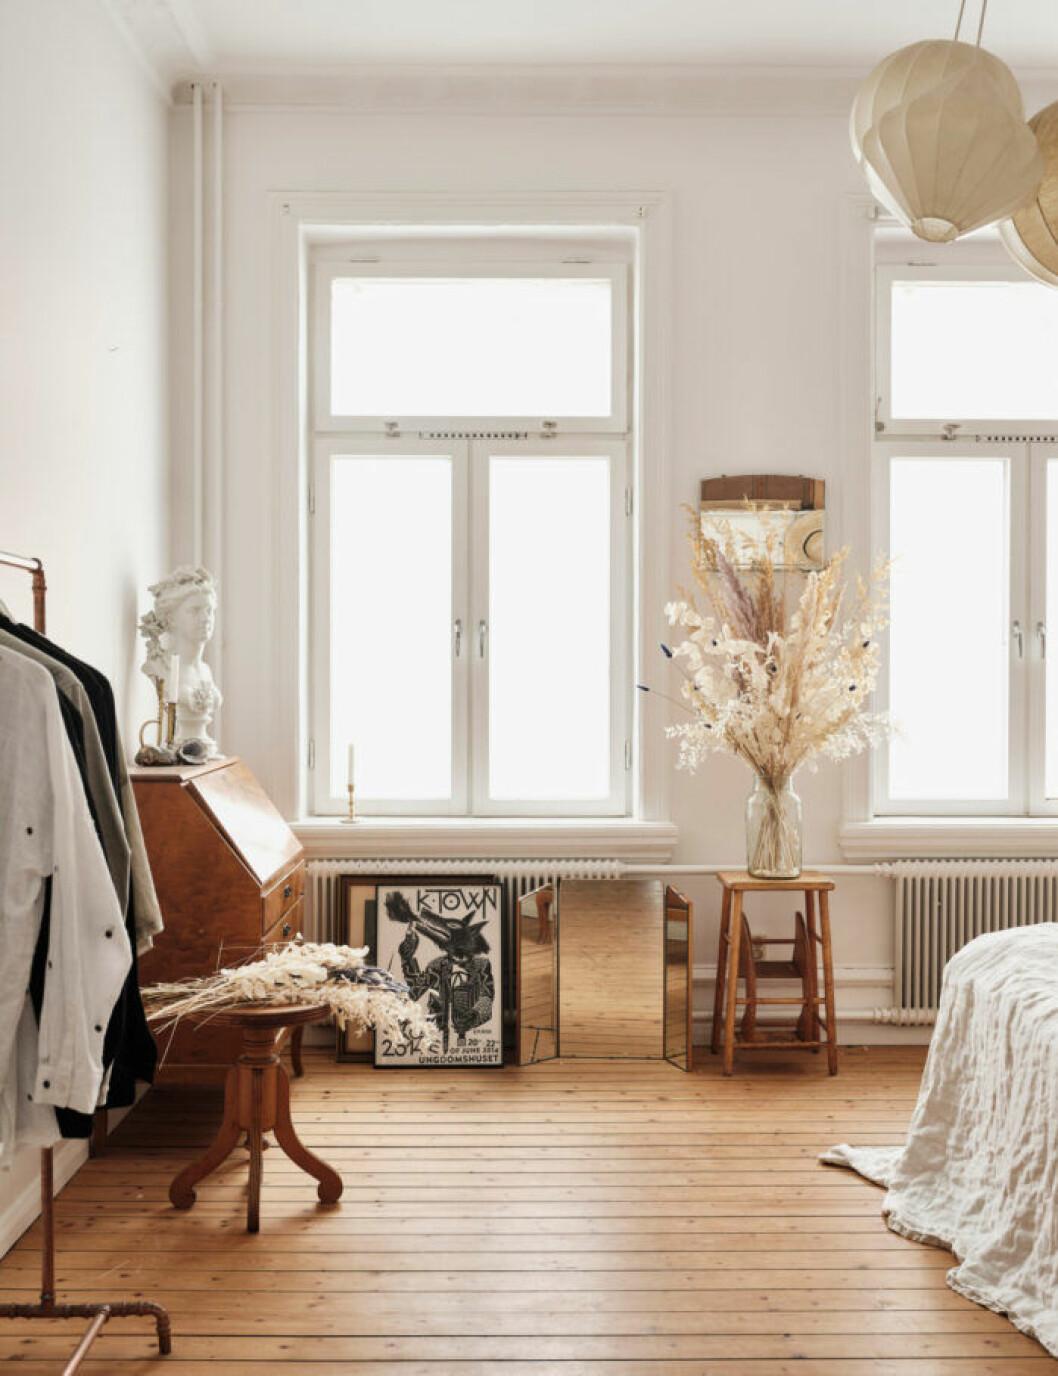 Sekelskifteslägenhet i Malmö, ljust sovrum